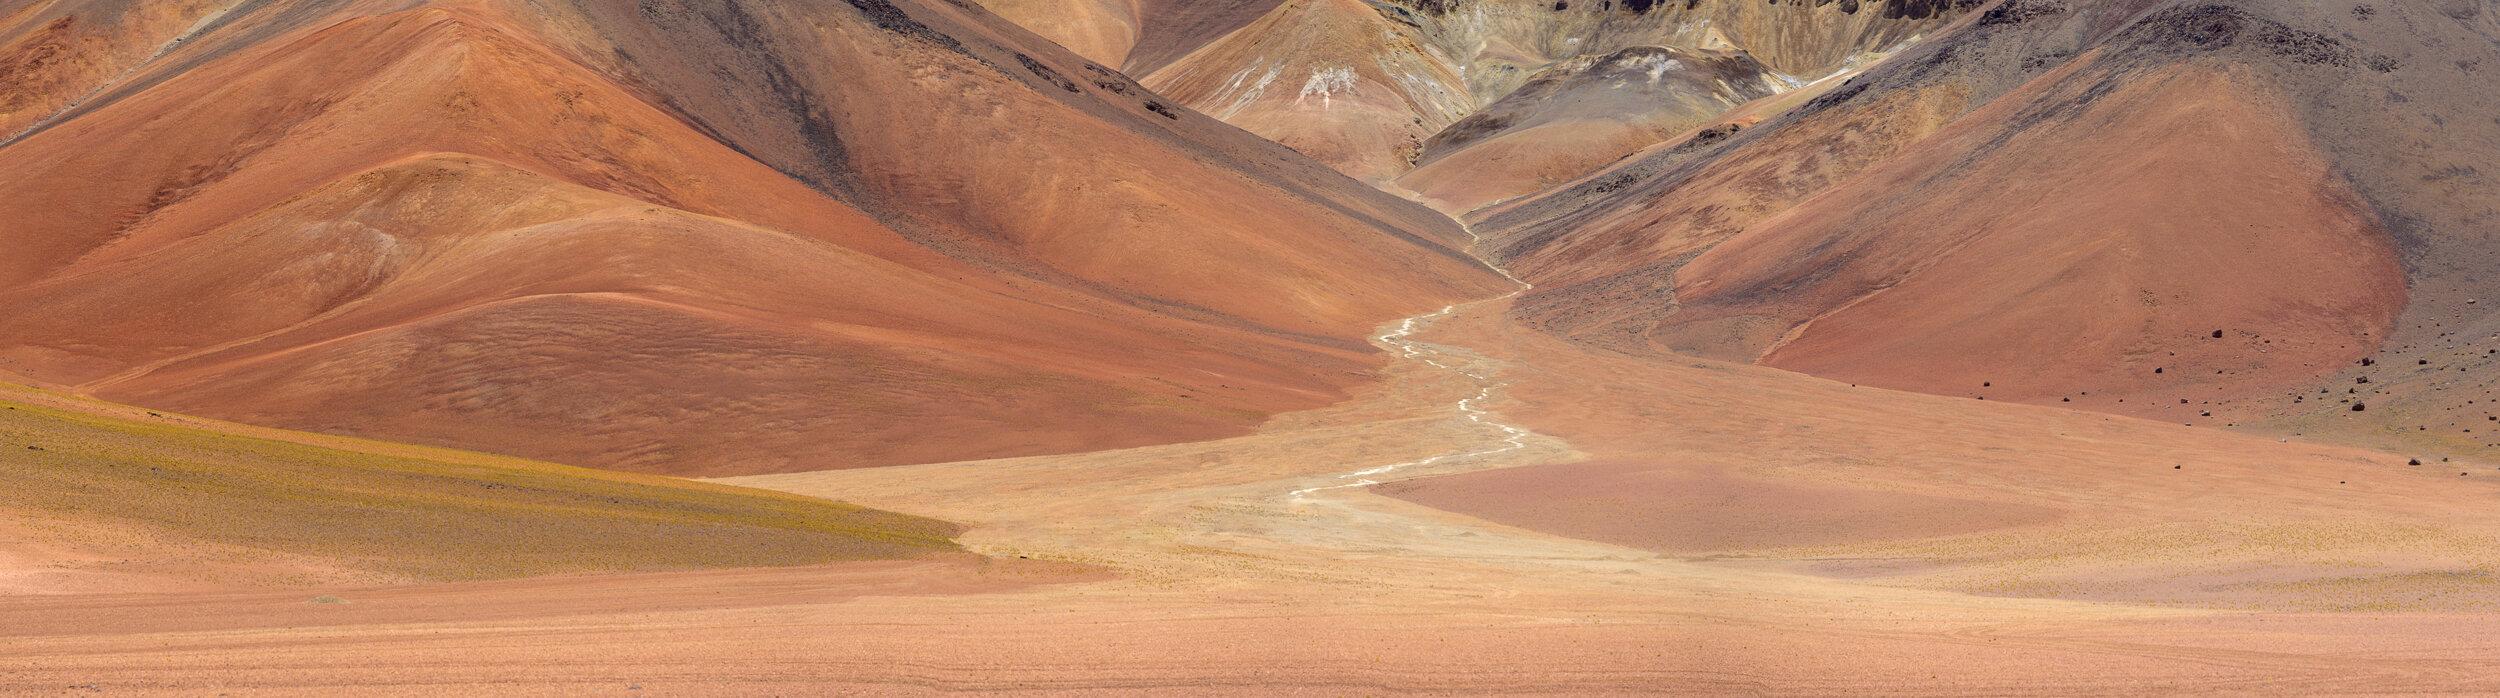 Bolivia-5809-Pano-Edit.jpg